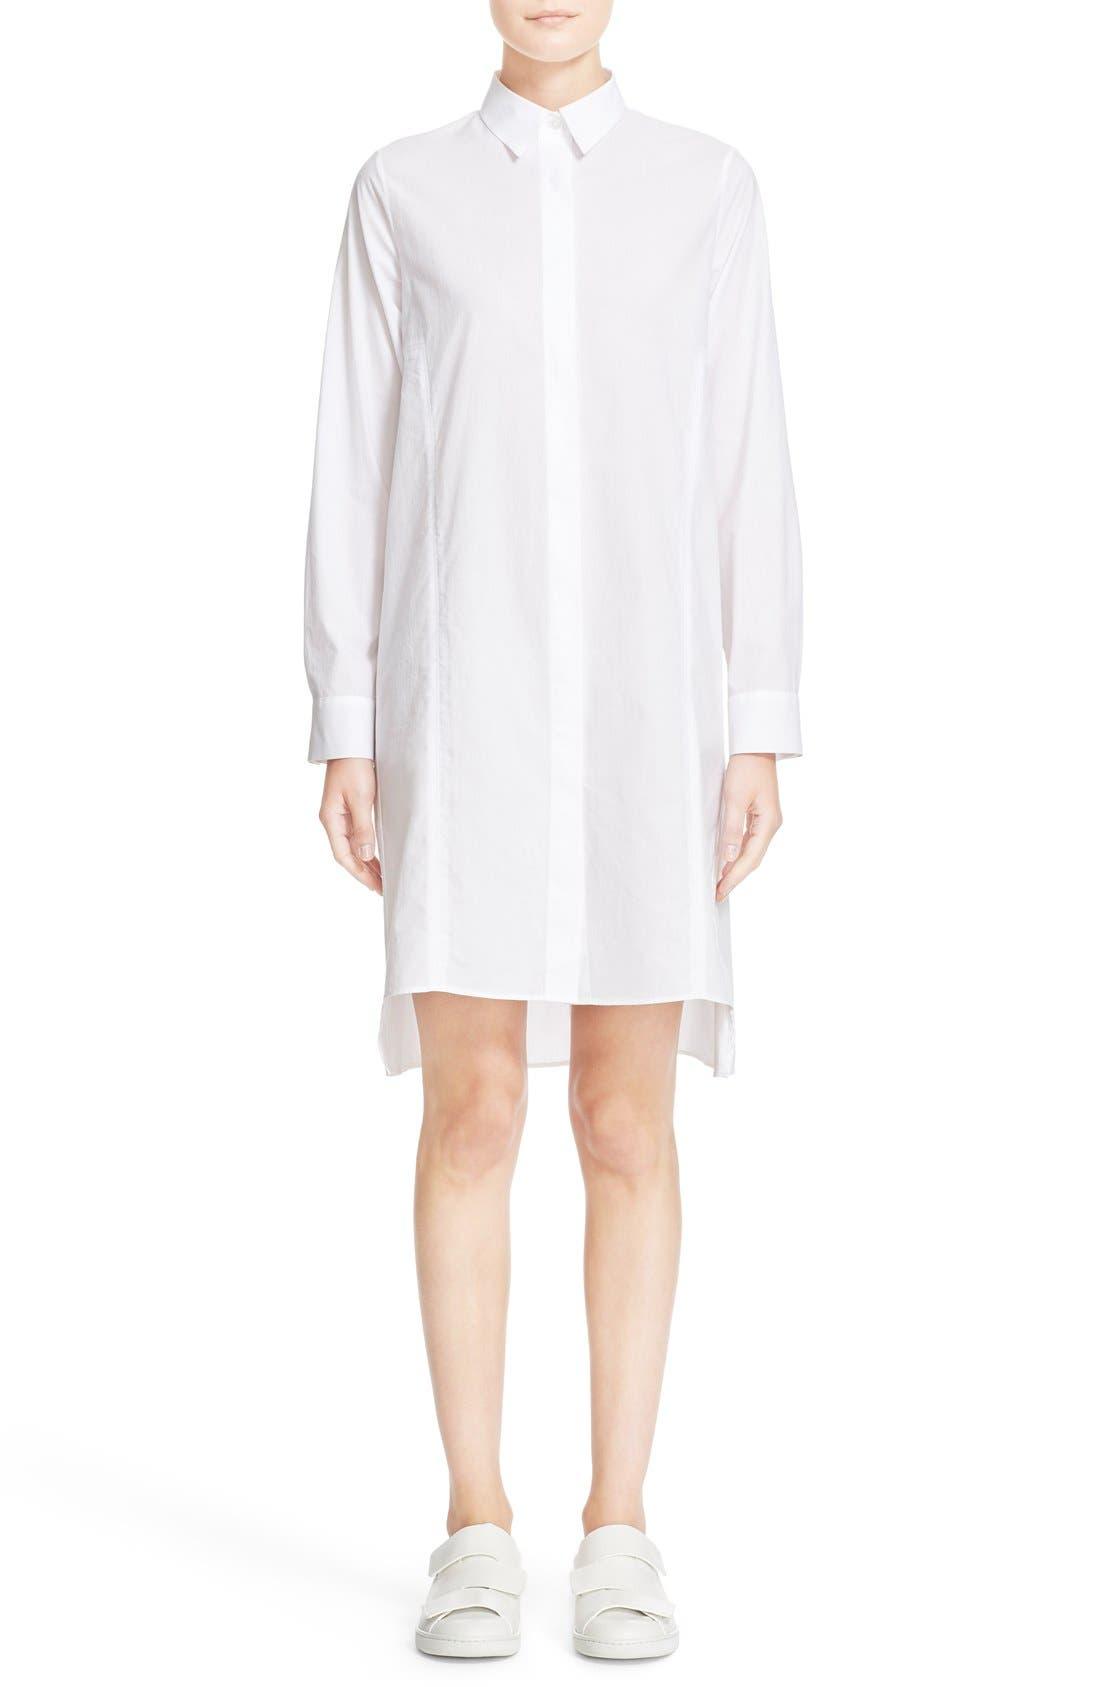 Alternate Image 1 Selected - ACNE Studios 'Rosamund' Piqué Shirtdress